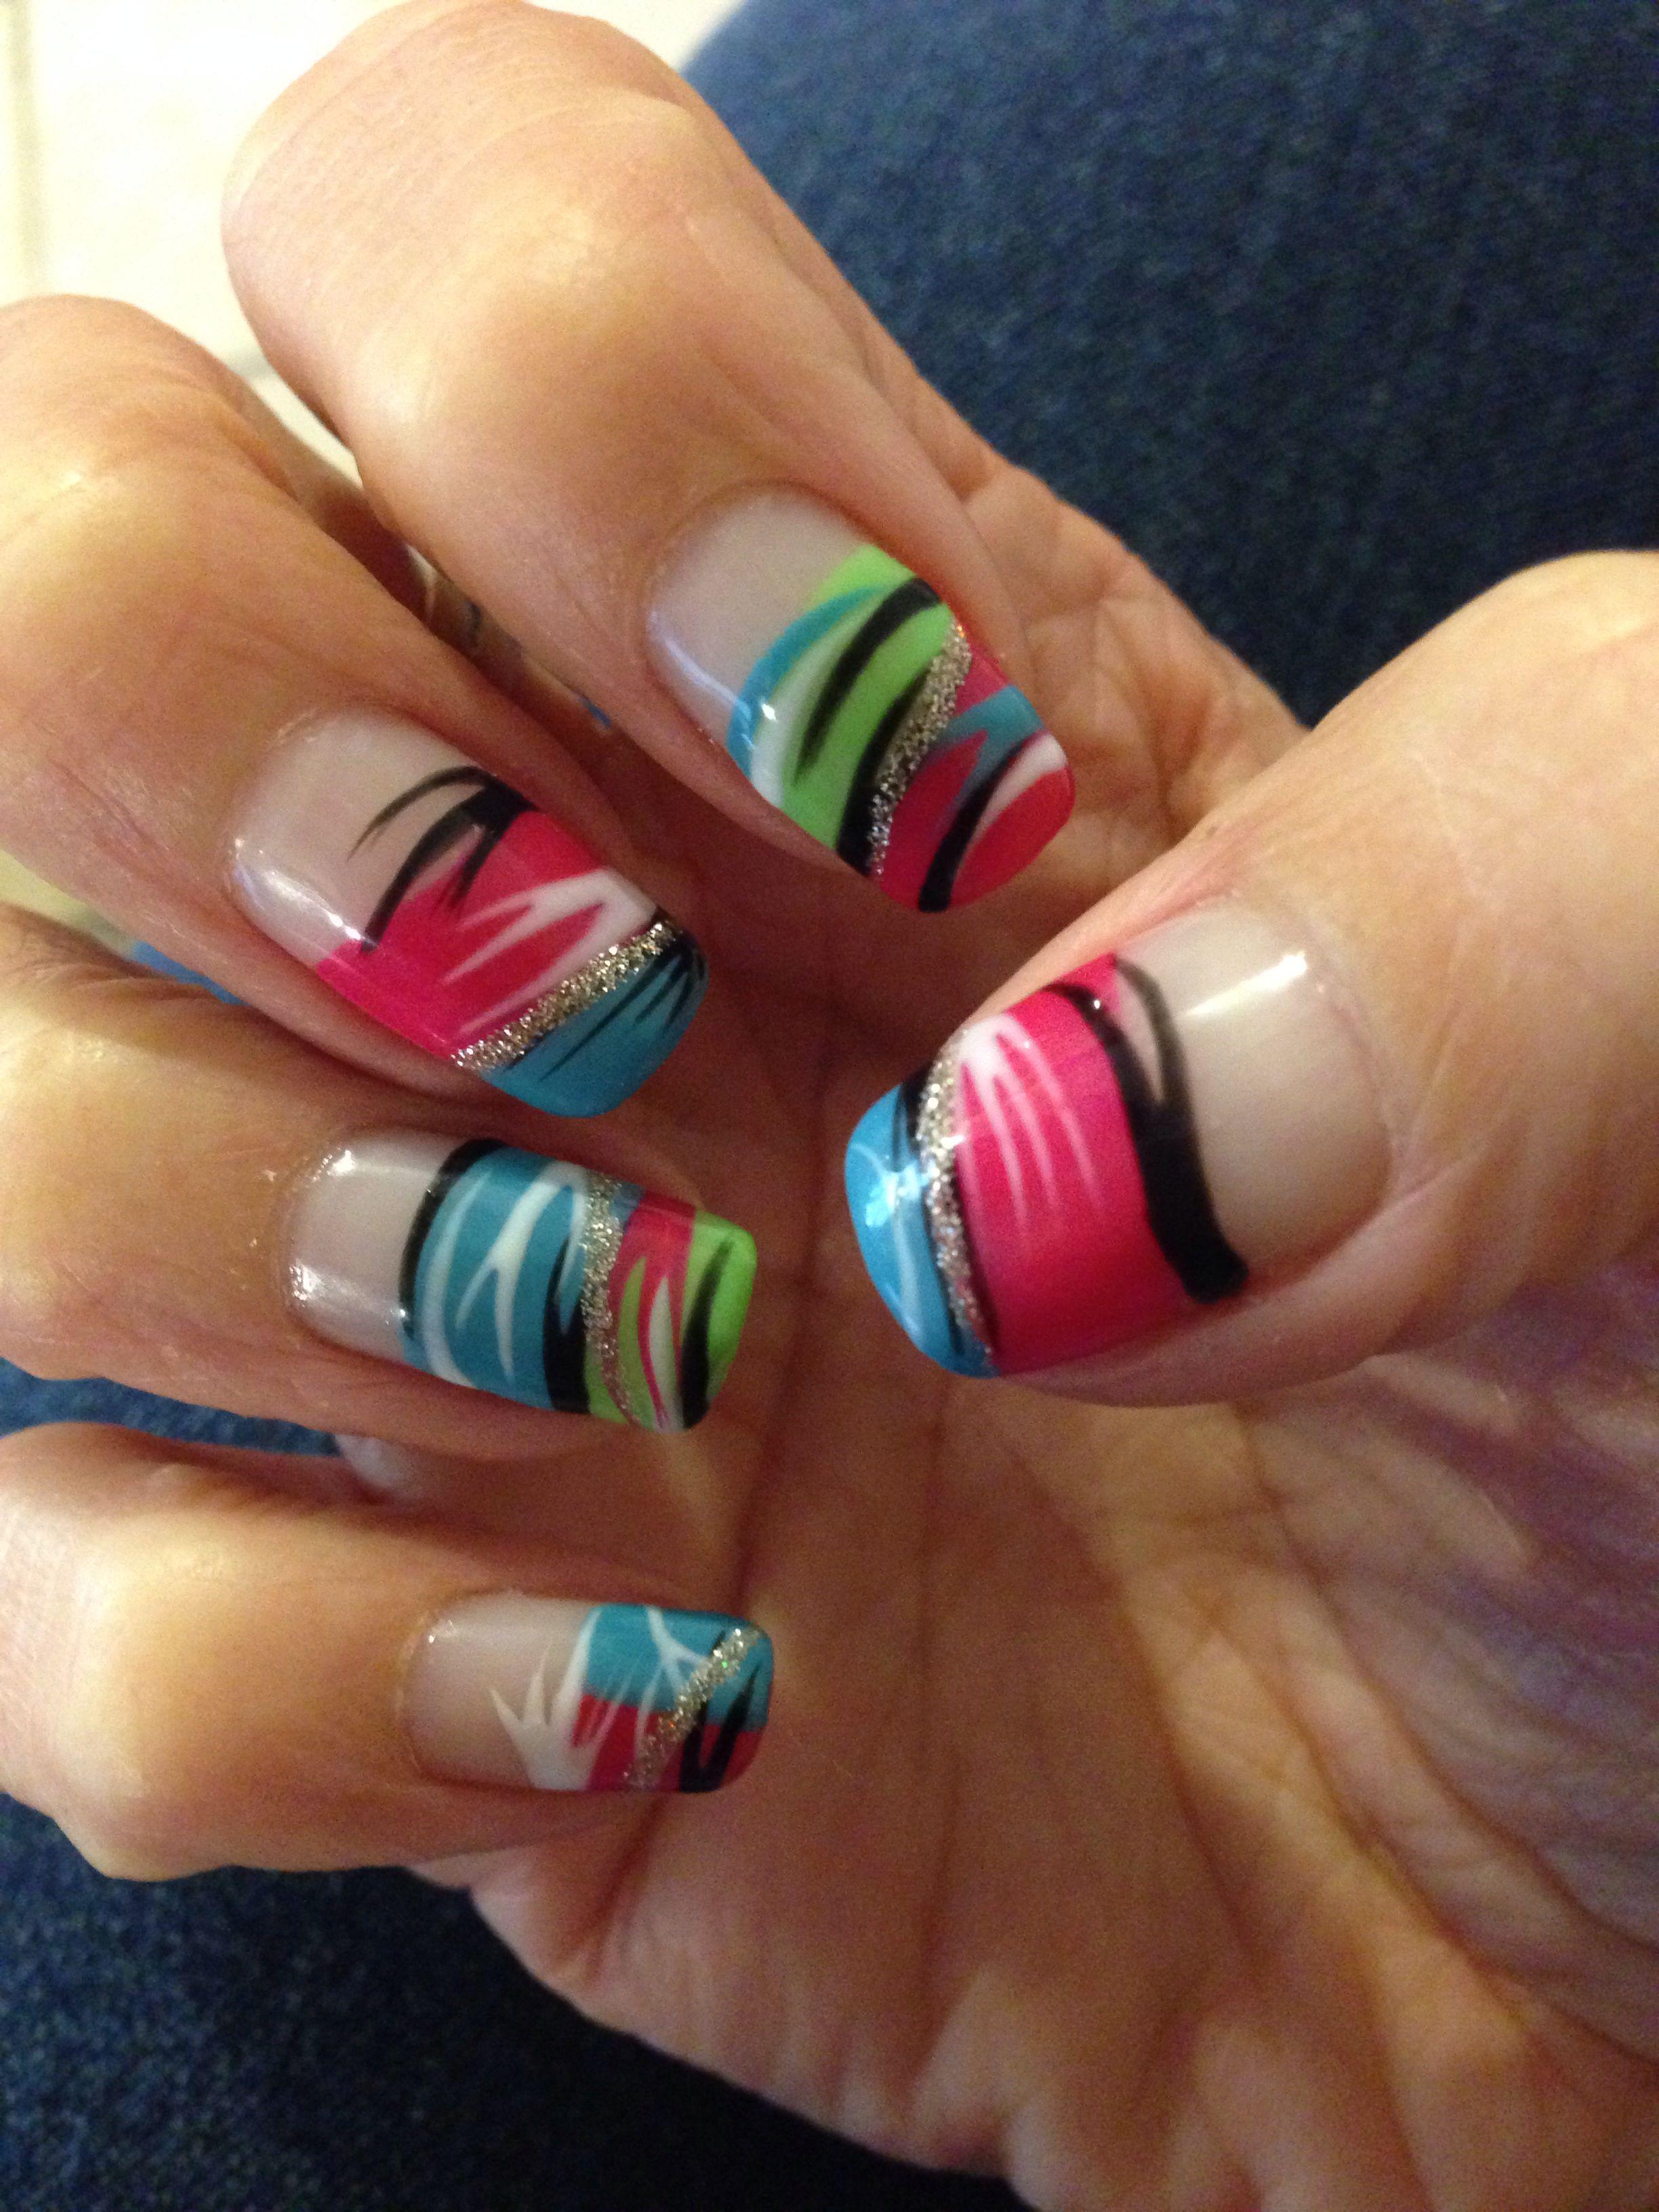 Just A Fun & Cool Gel Nail Design